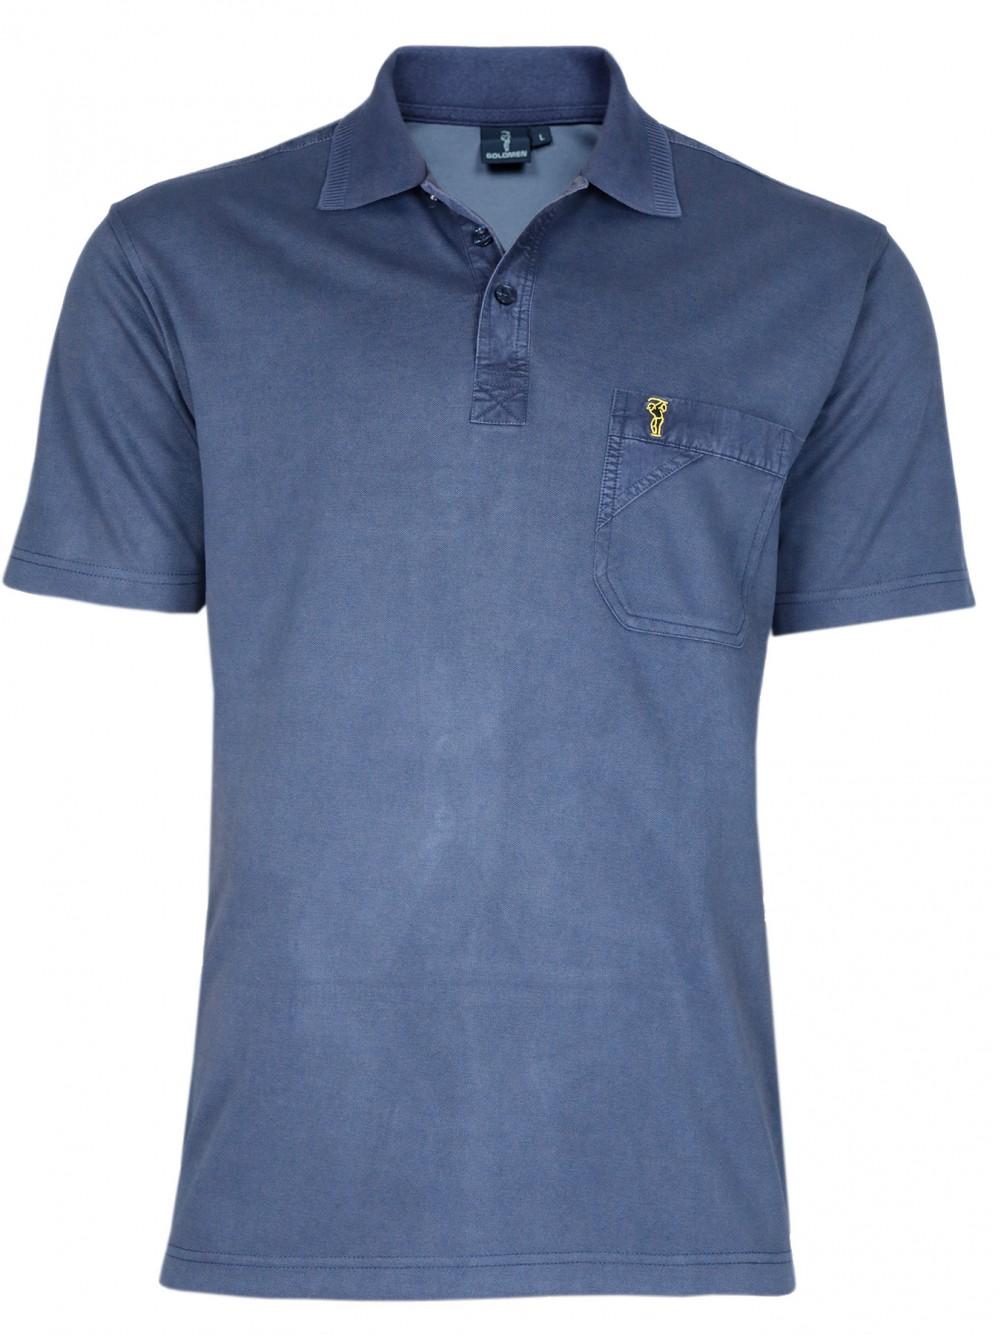 Poloshirt Piqué-Polo aus Baumwoll-Stretch - Navy